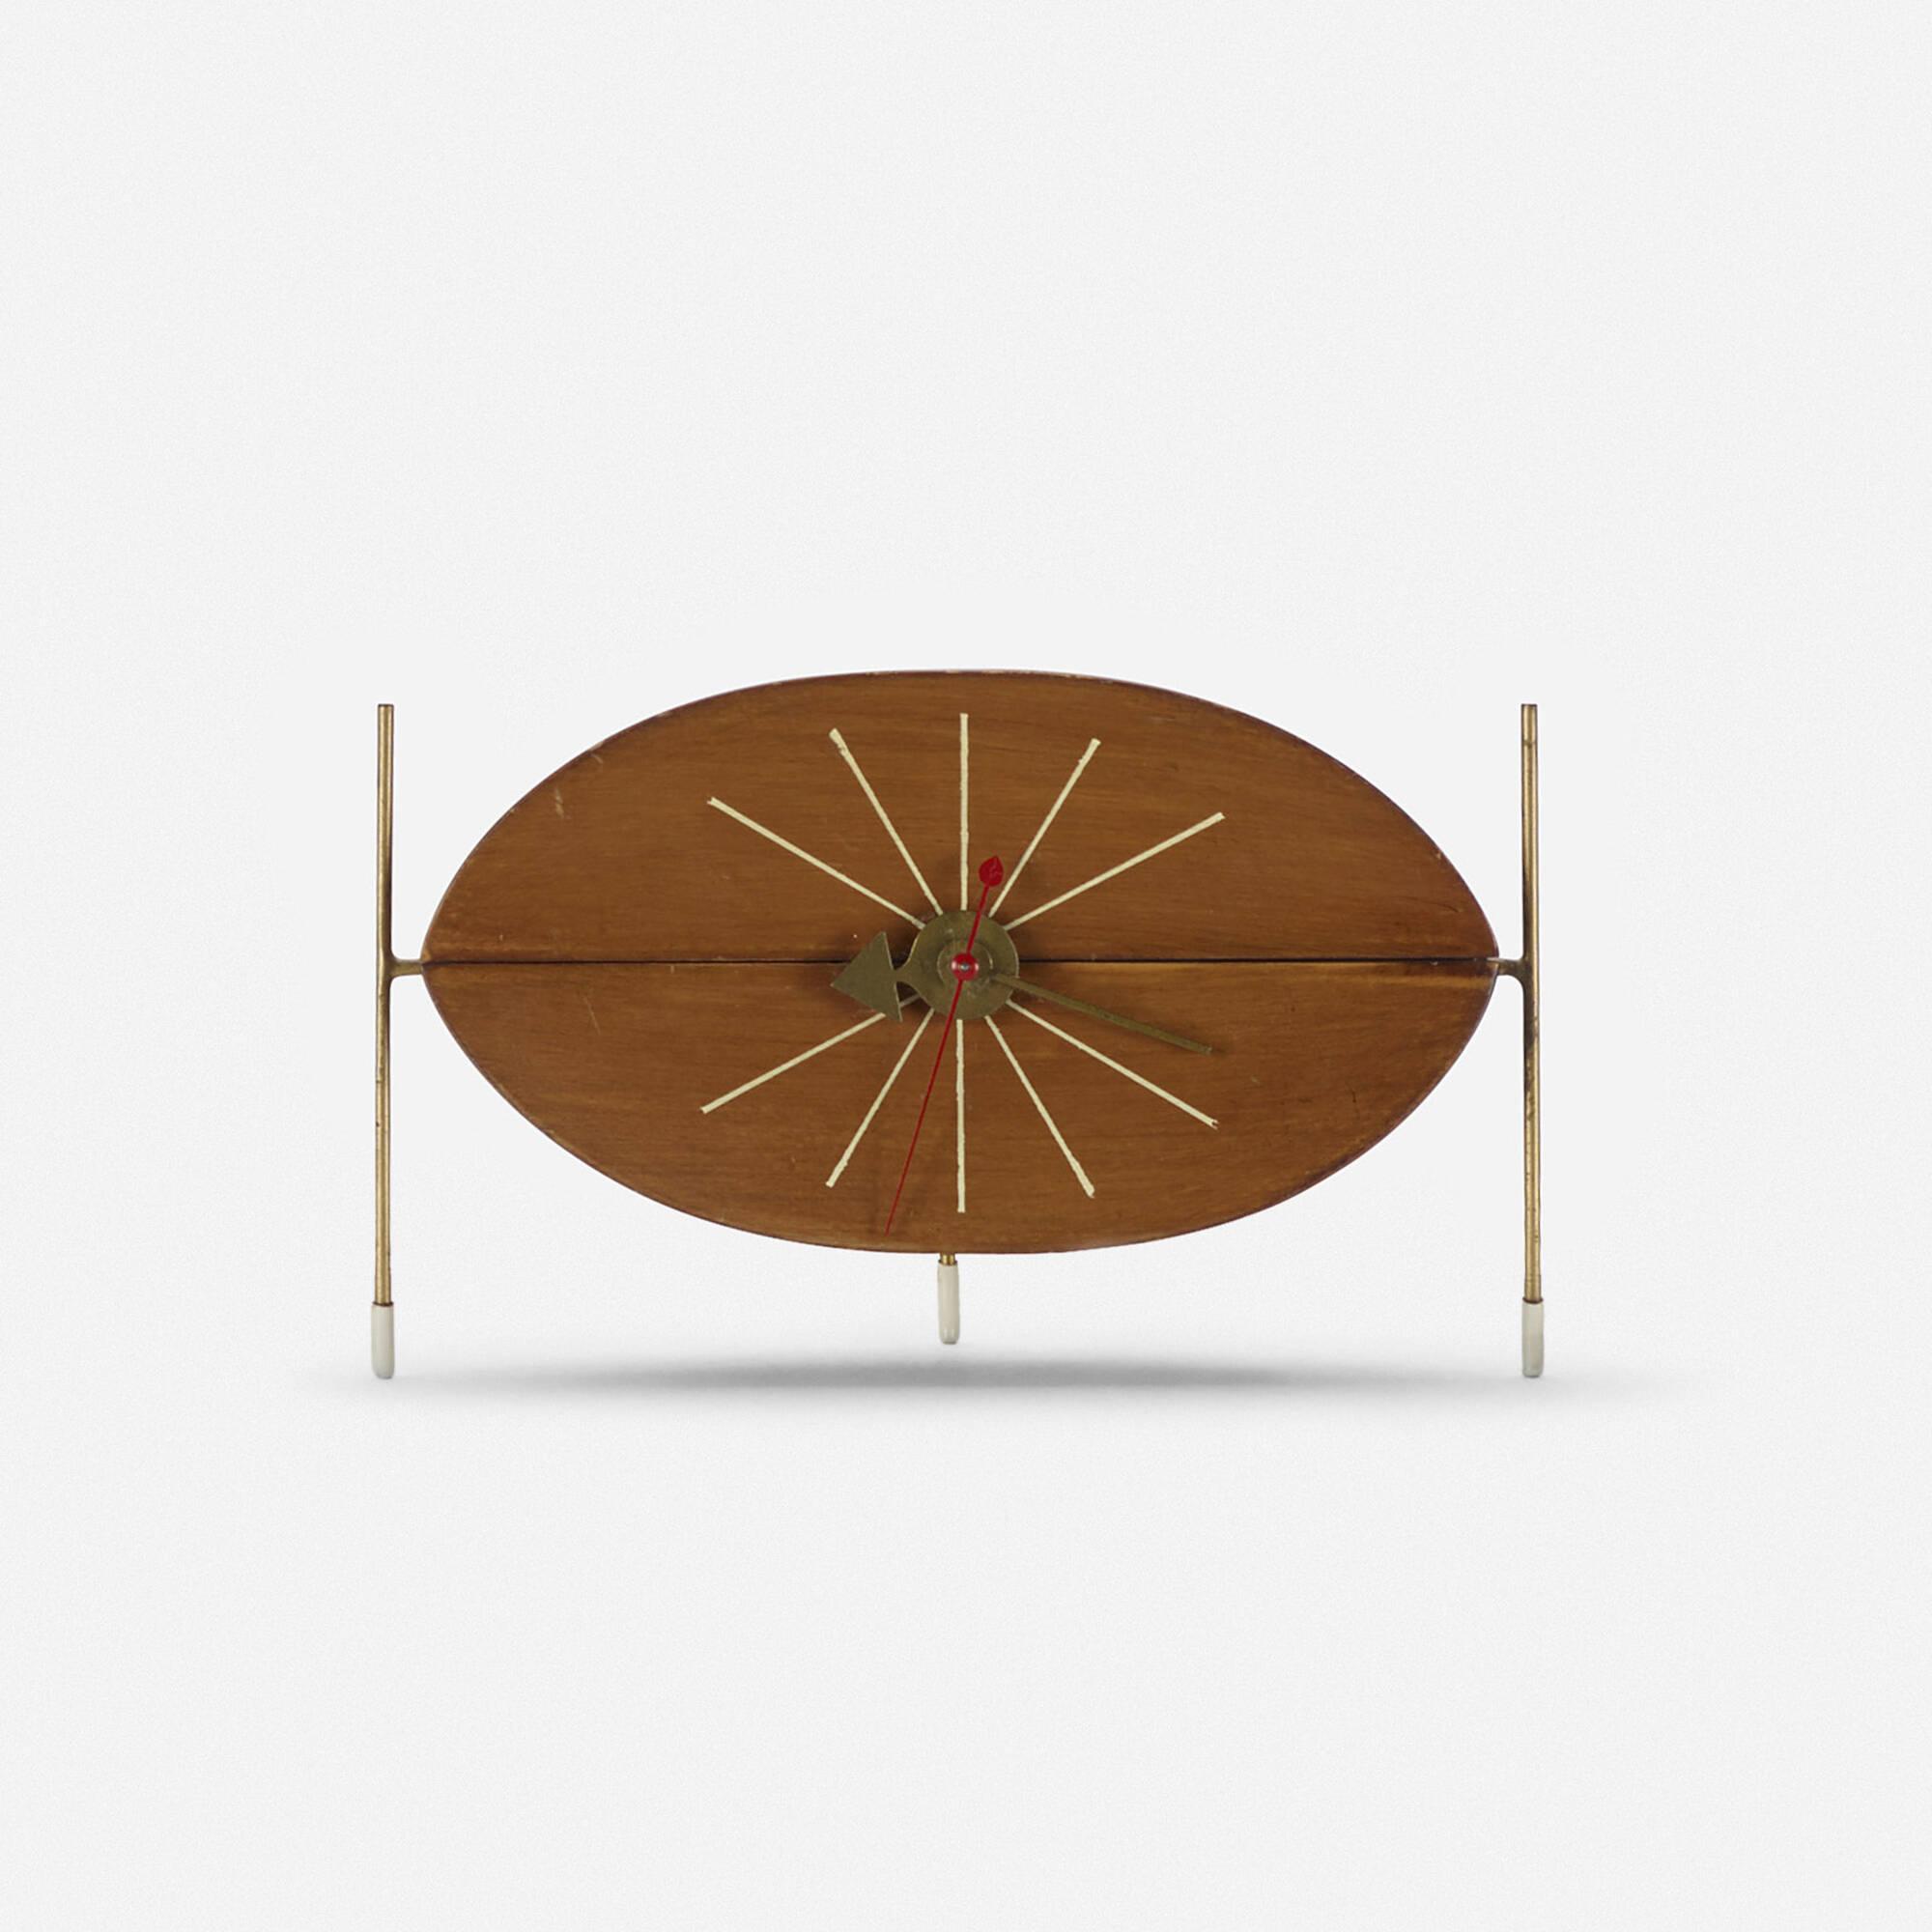 201: George Nelson & Associates / Watermelon table clock, model 2219D (1 of 1)